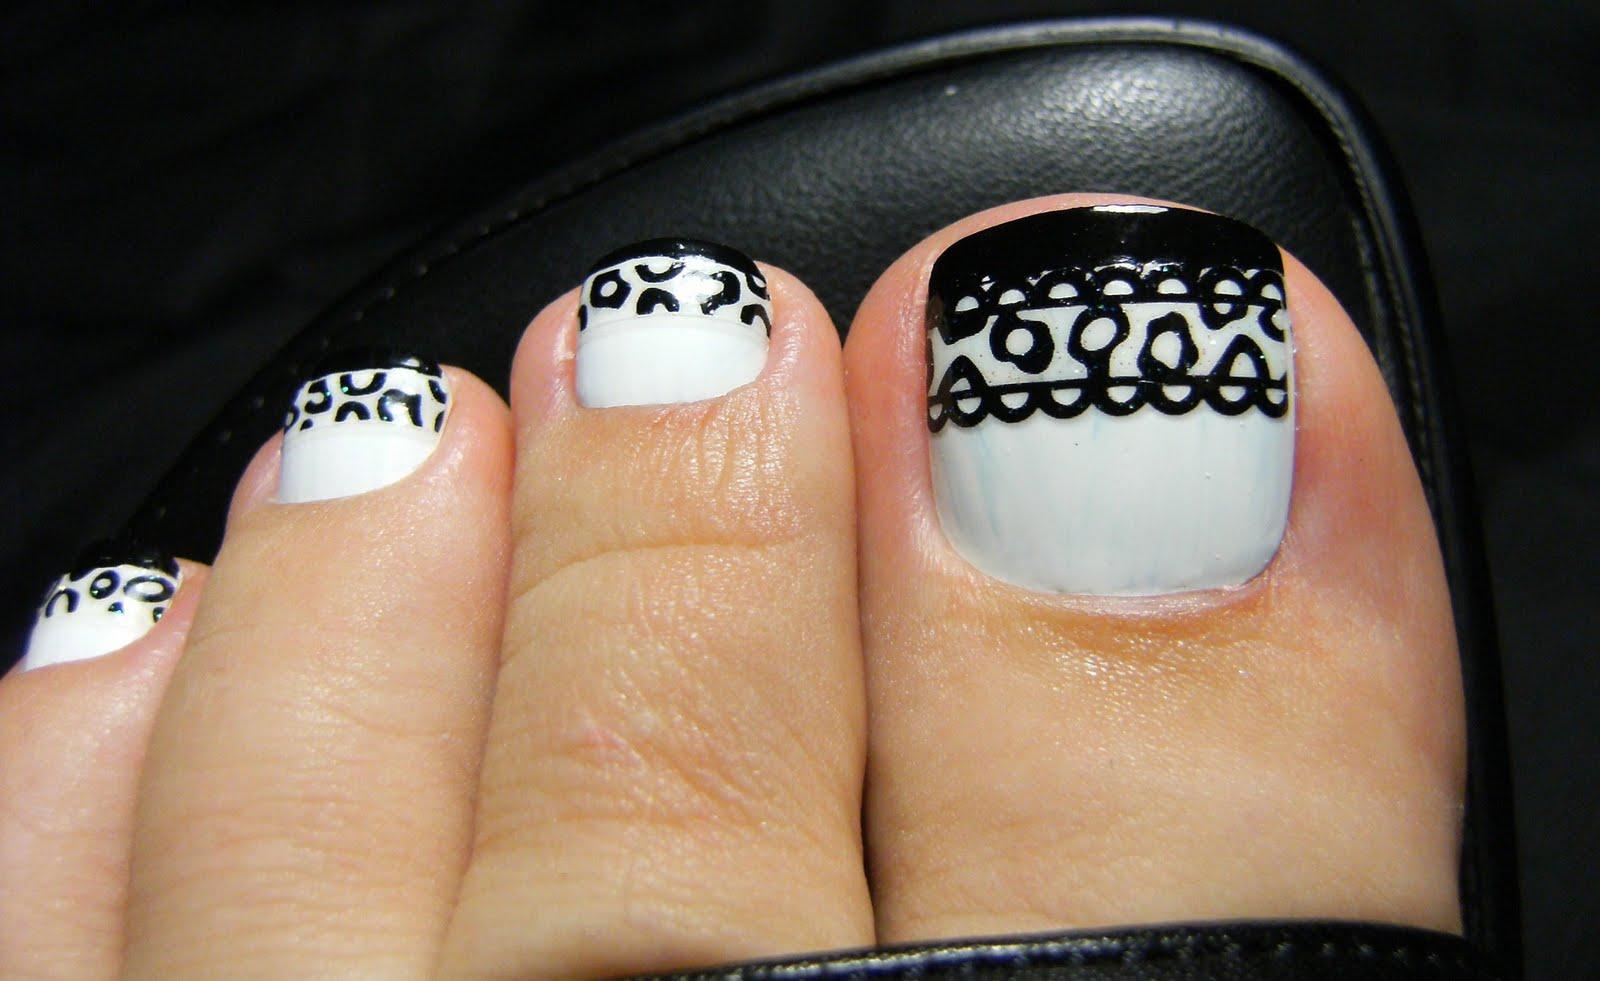 What do horizontal white lines on toenails indicate? | ChaCha